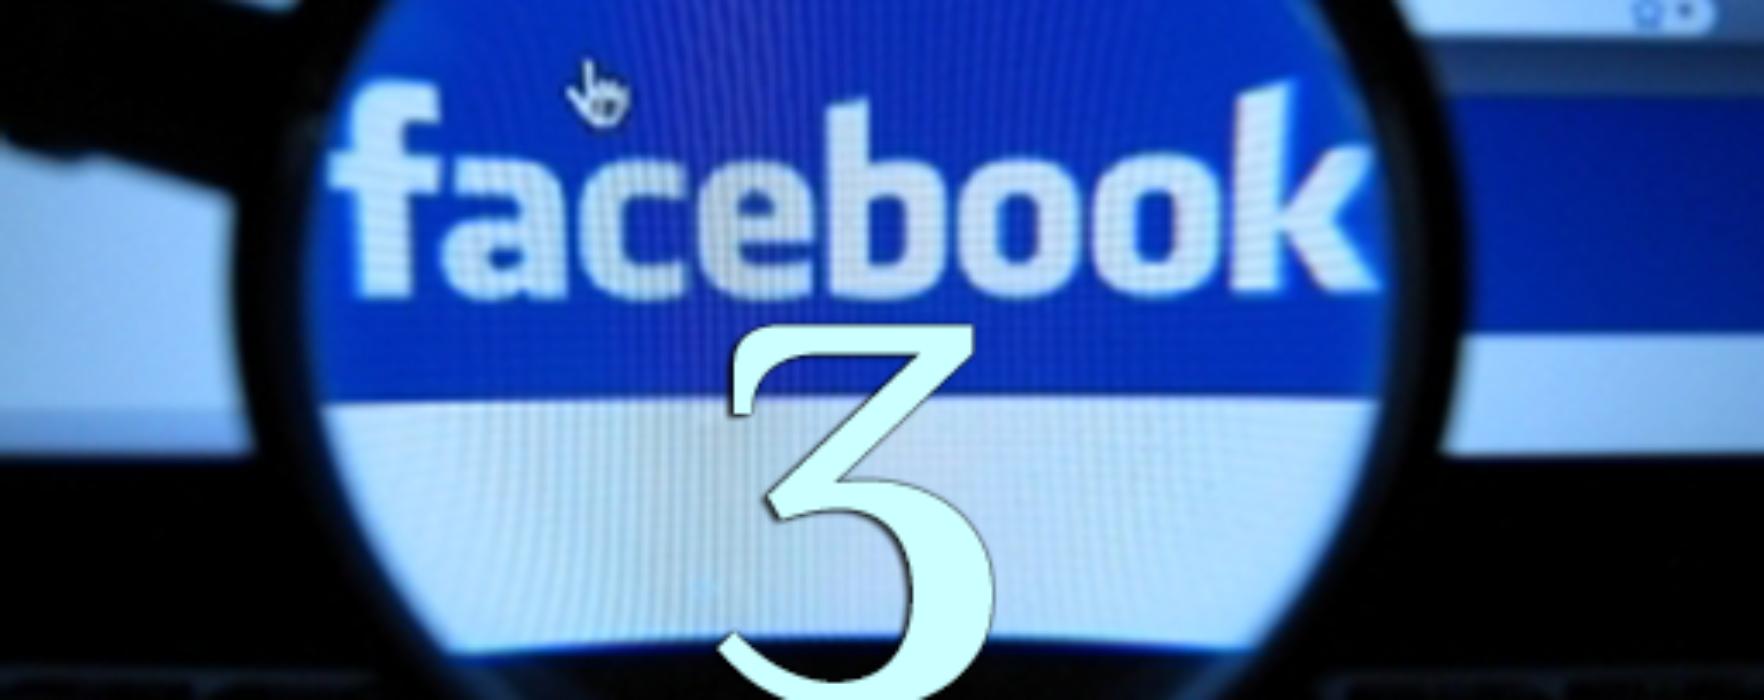 Facebook Explorer 3.0